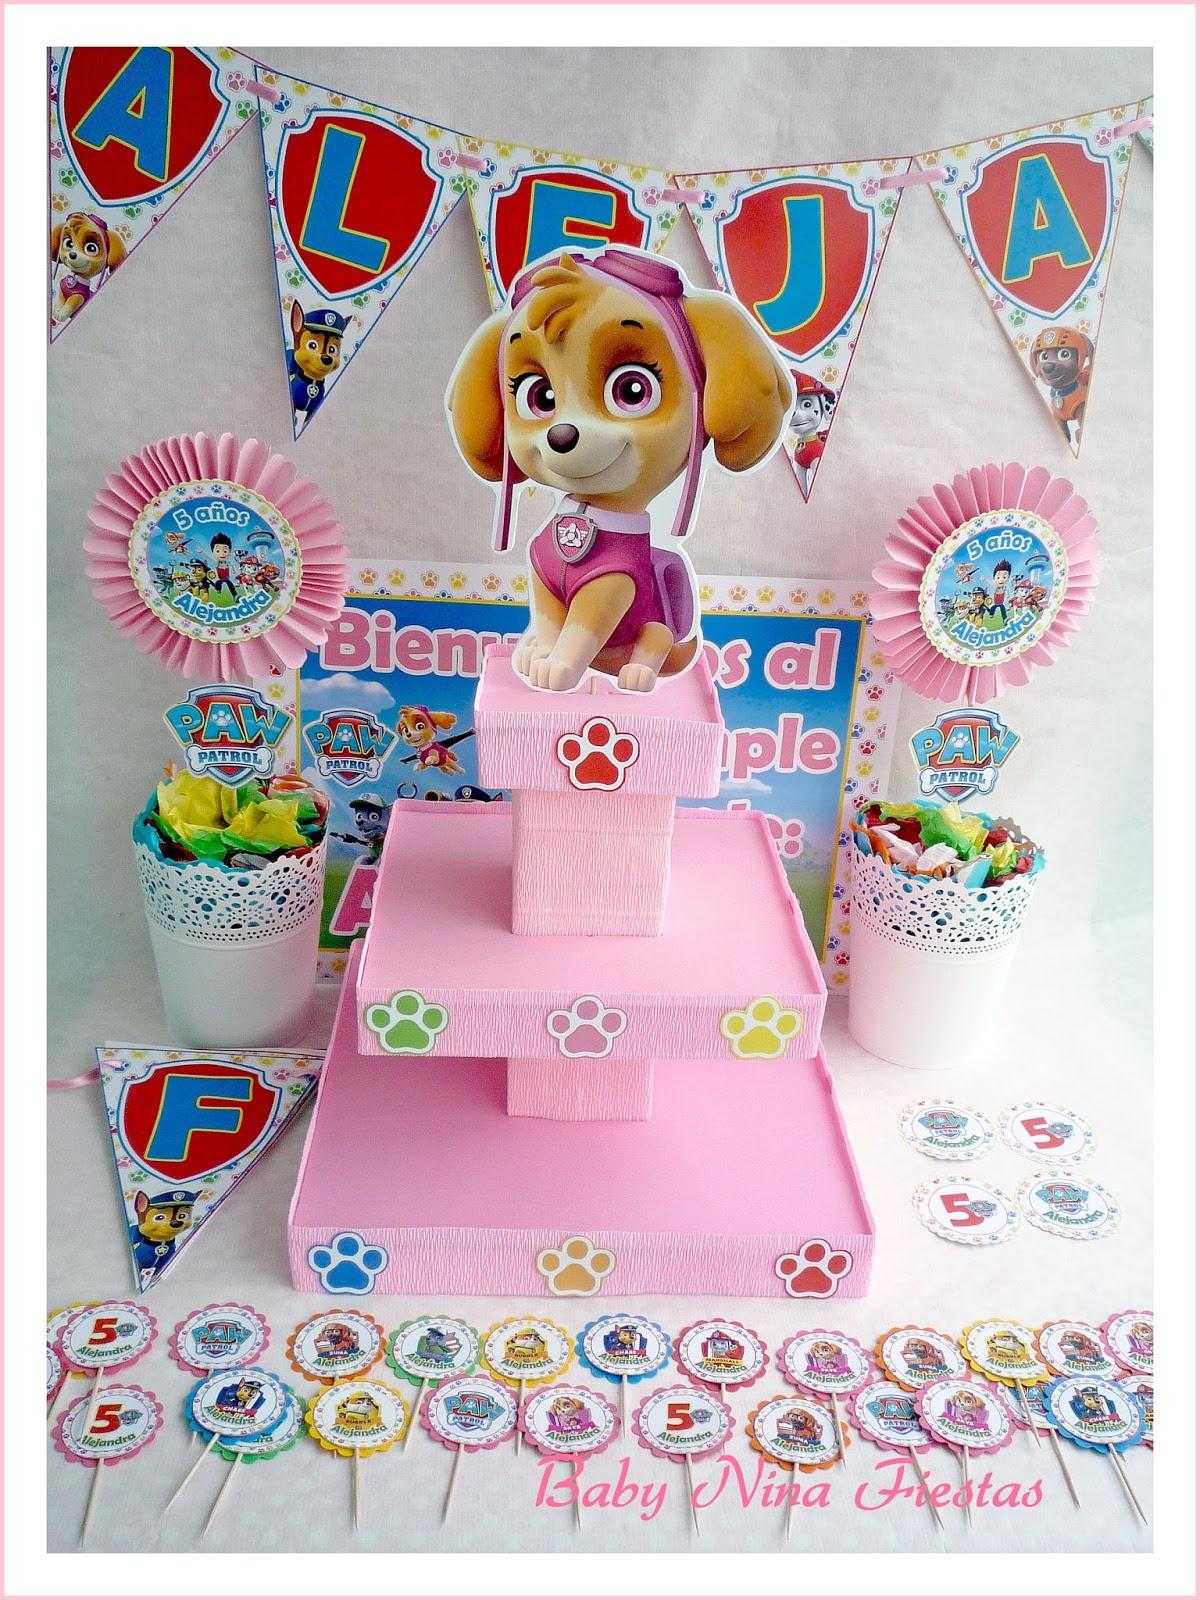 Baby nina fiestas kit de cumplea os patrulla canina sky - Cumpleanos patrulla canina ...